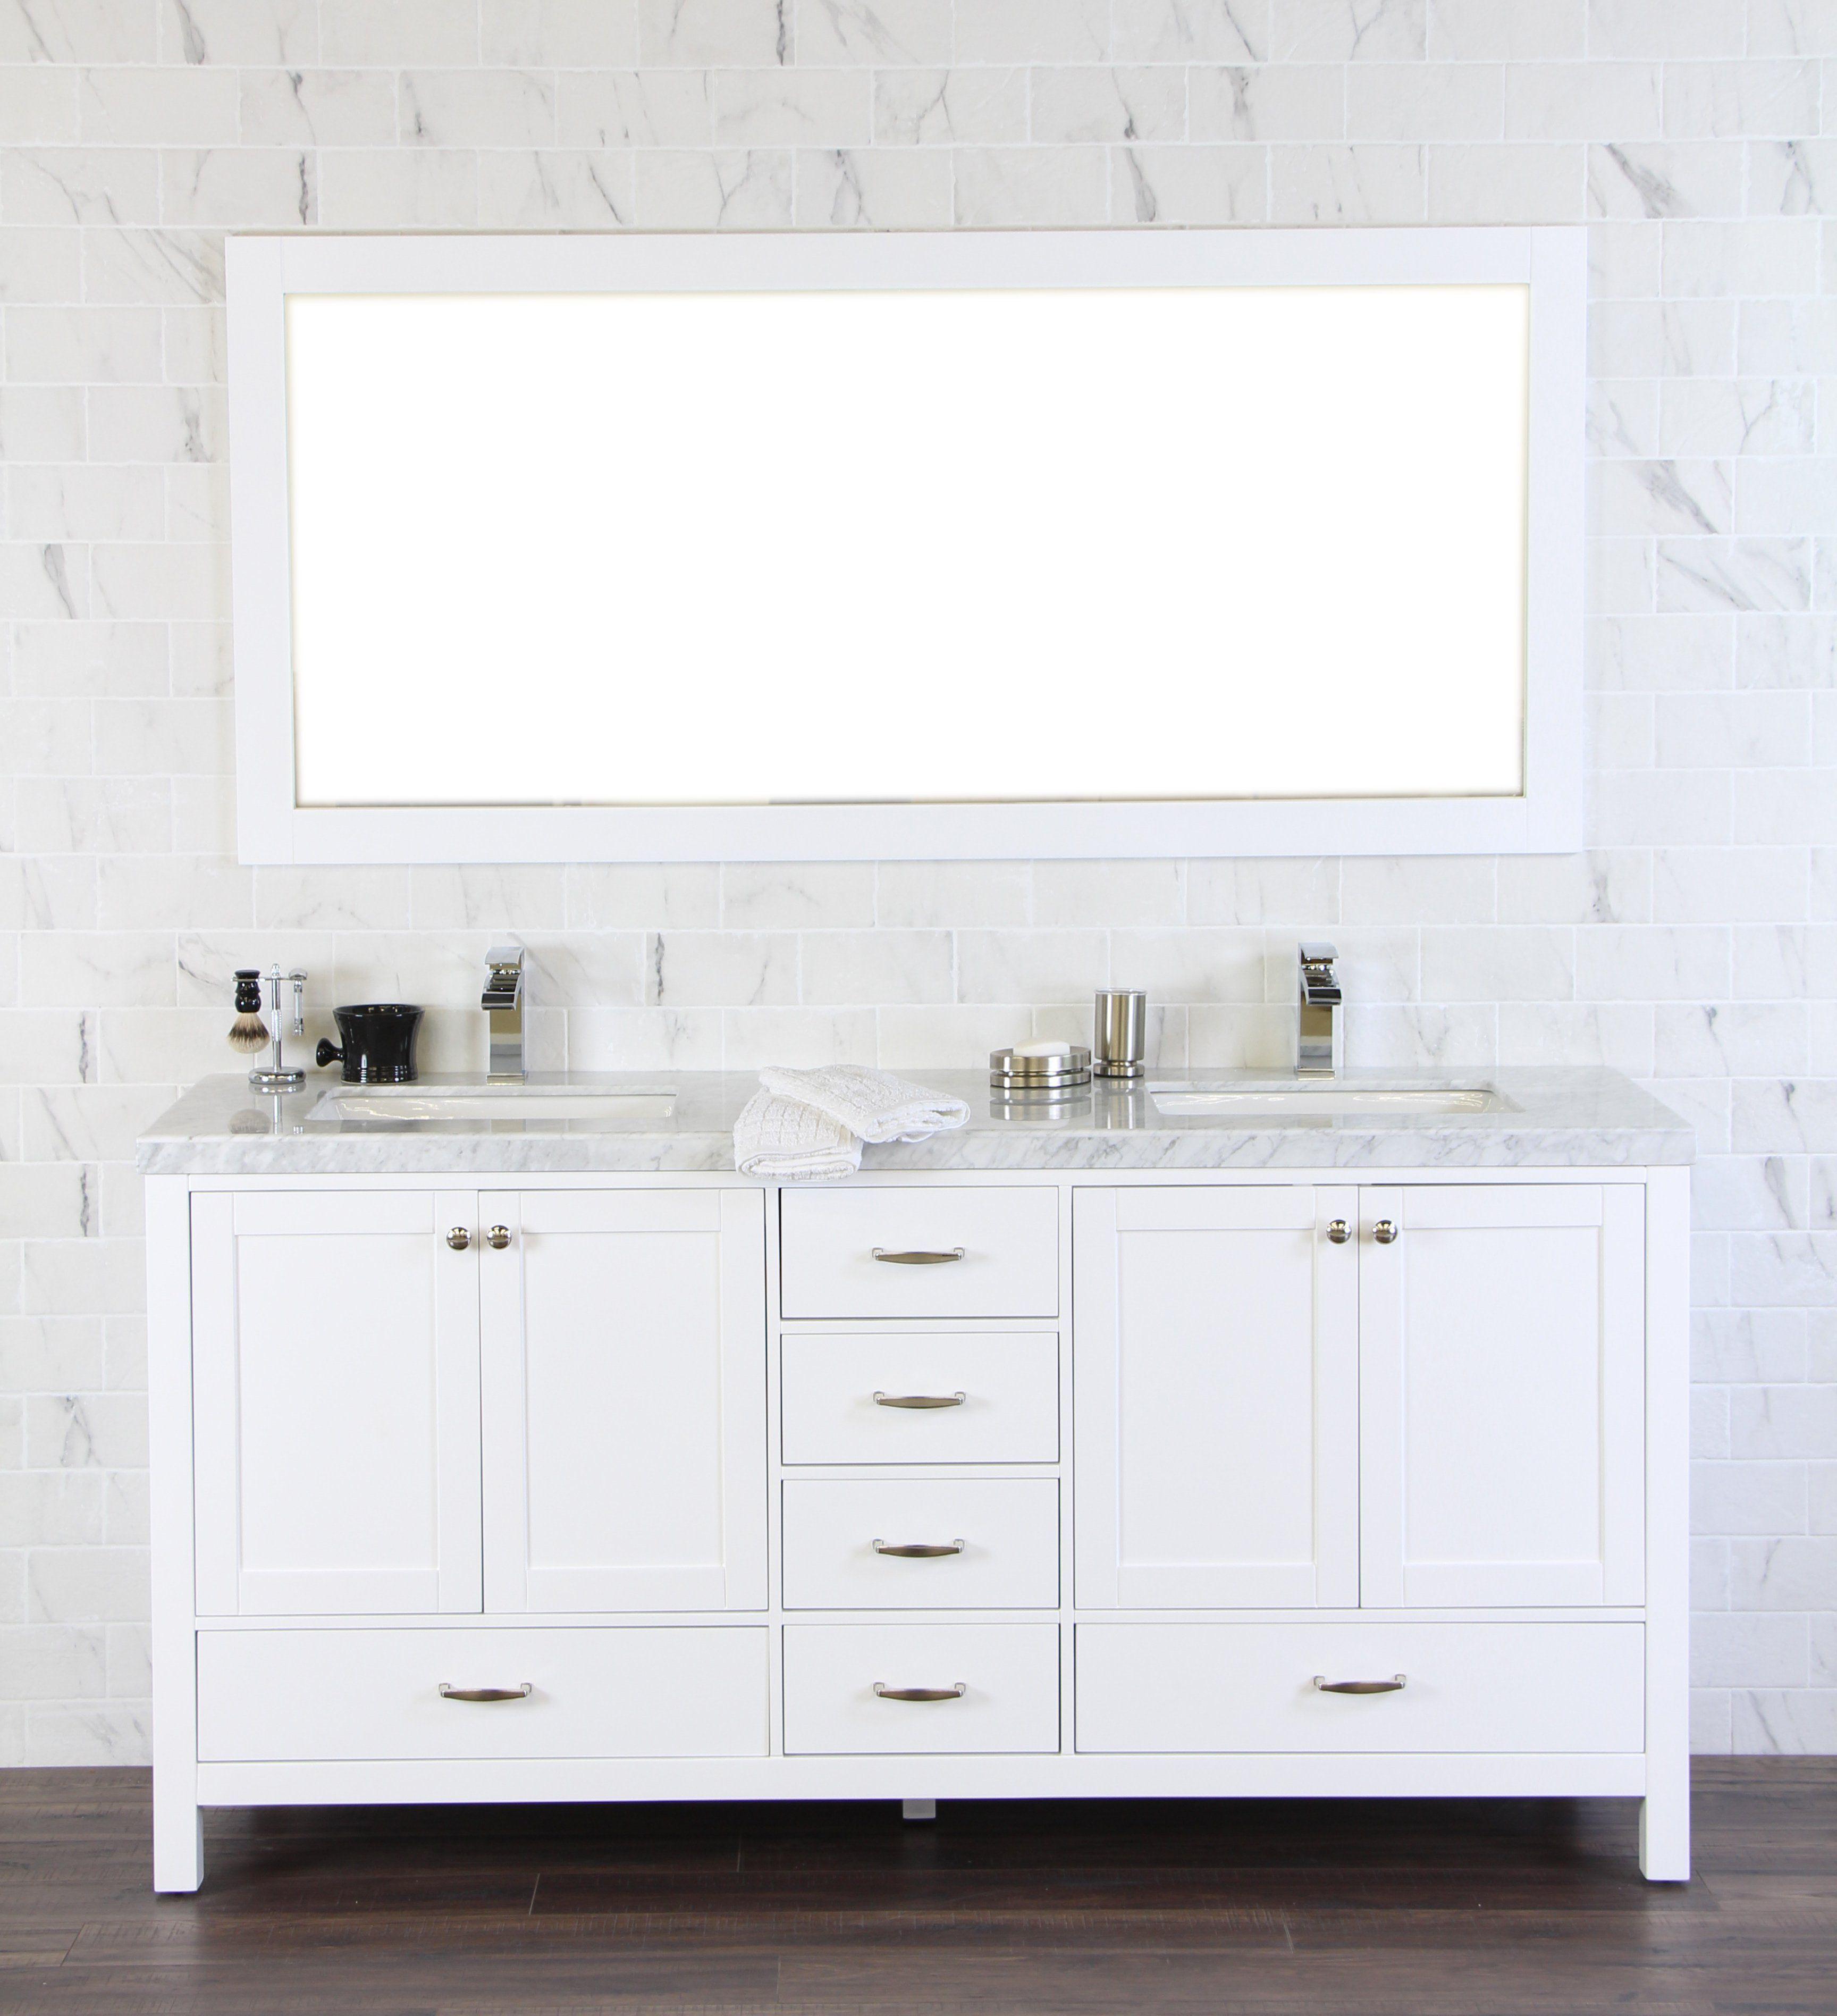 Double sink white bathroom vanities abigail